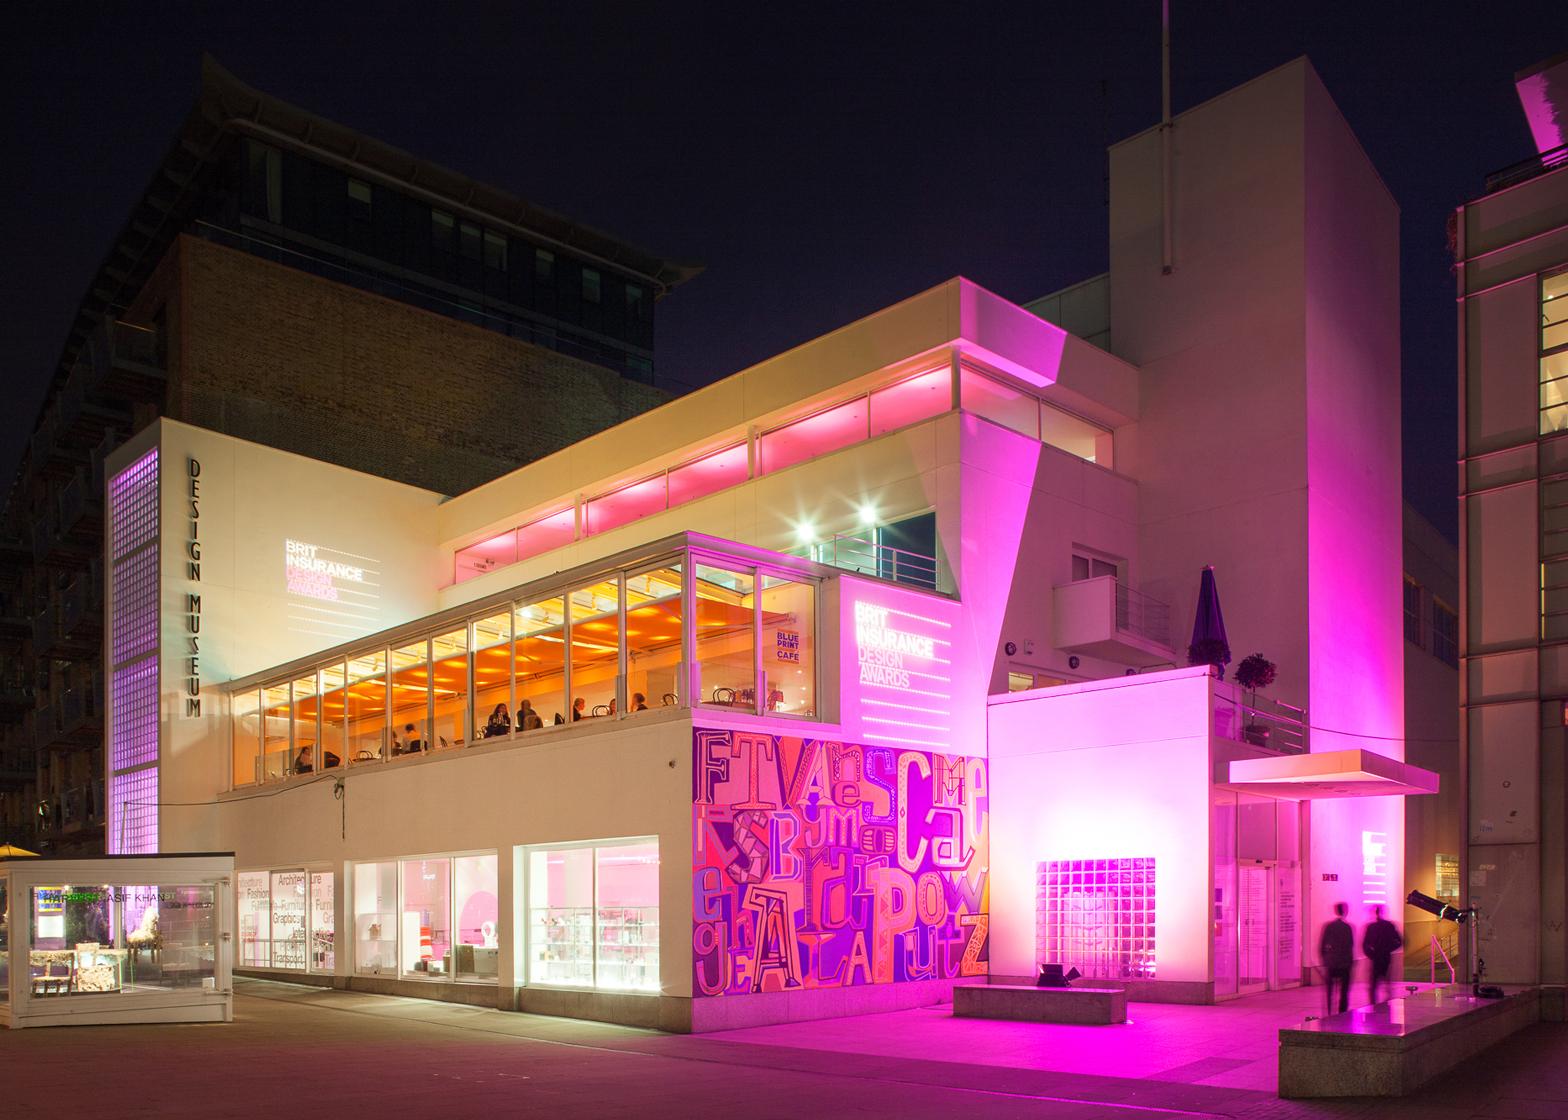 Design Museum Shad Thames